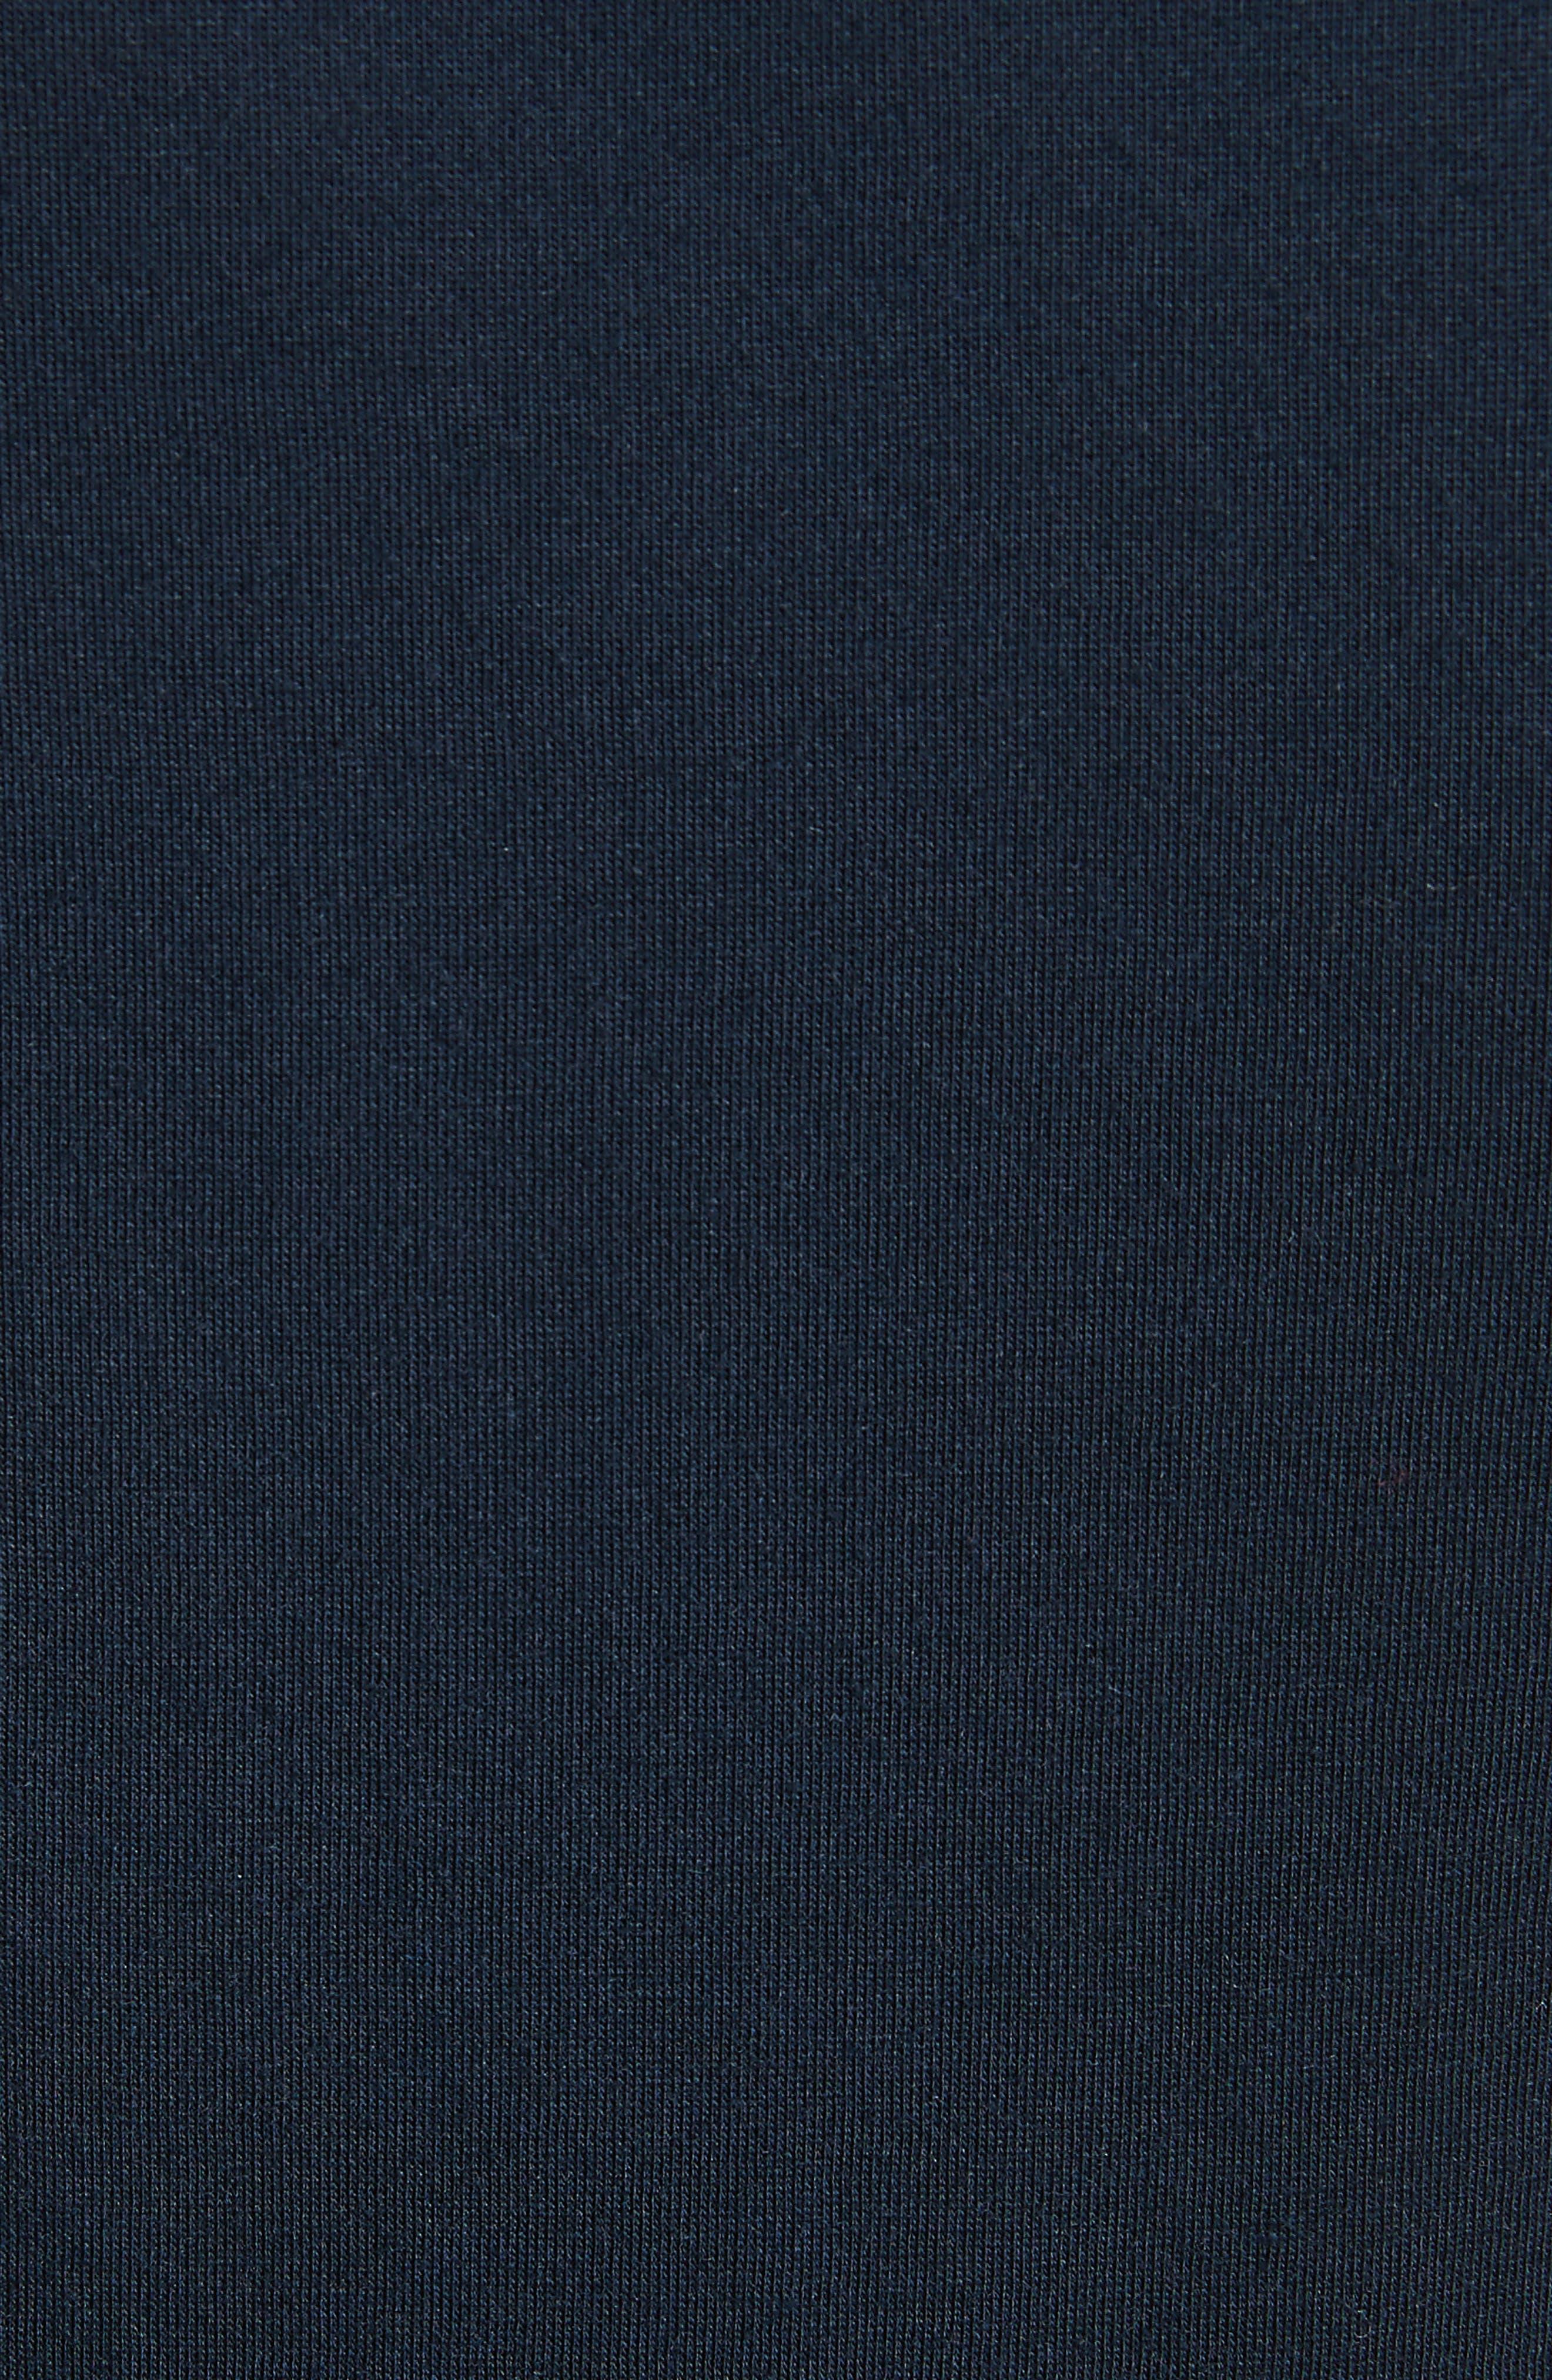 Plume Seamed Cotton Blend Jersey Dress,                             Alternate thumbnail 5, color,                             491